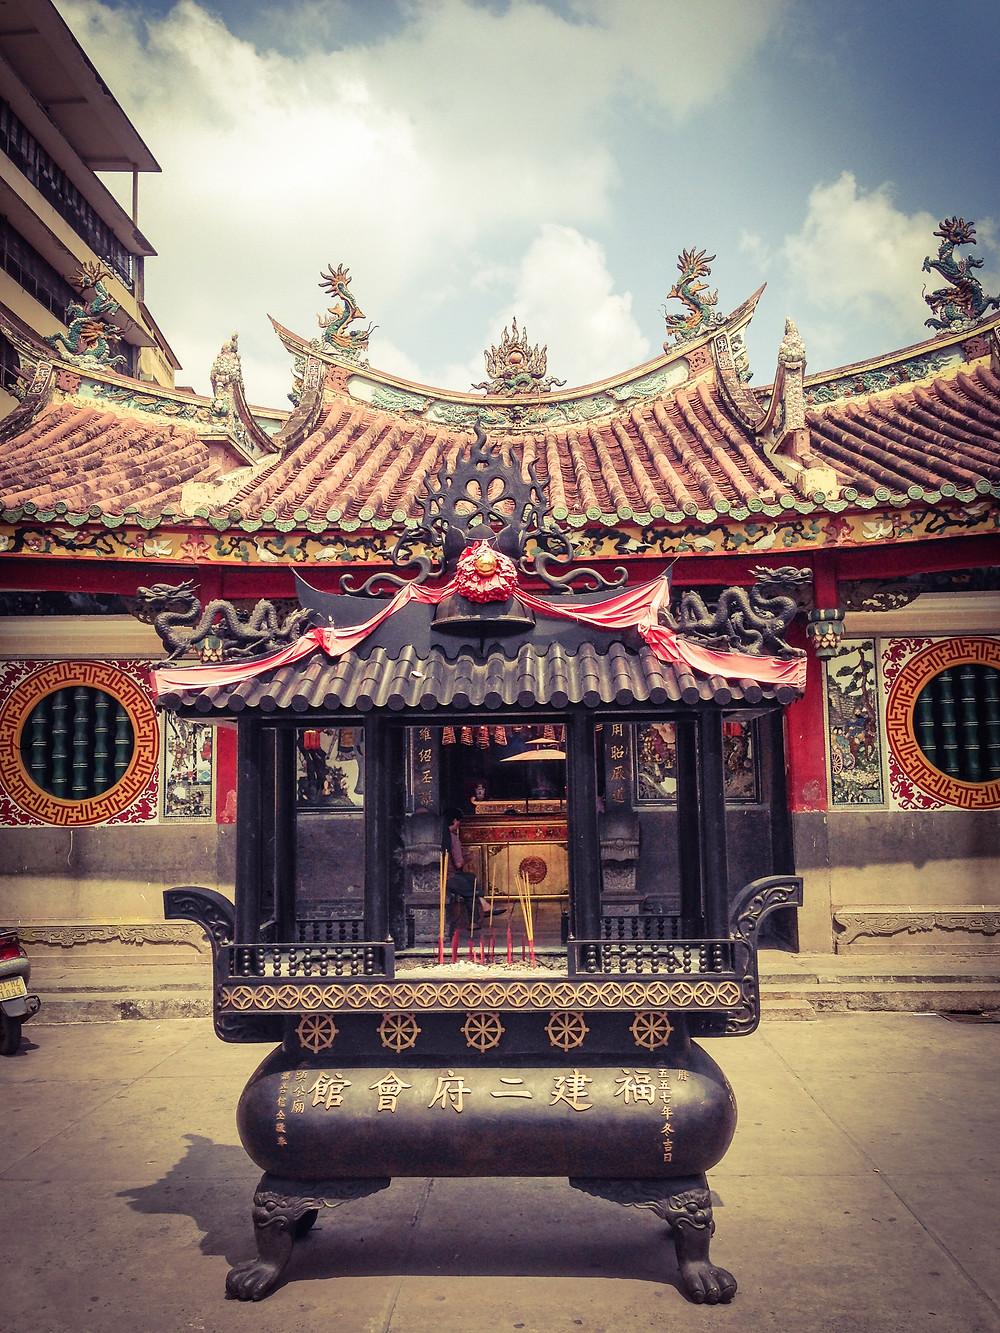 Temple in Saigon, Ho Chi Minh City Vietnam